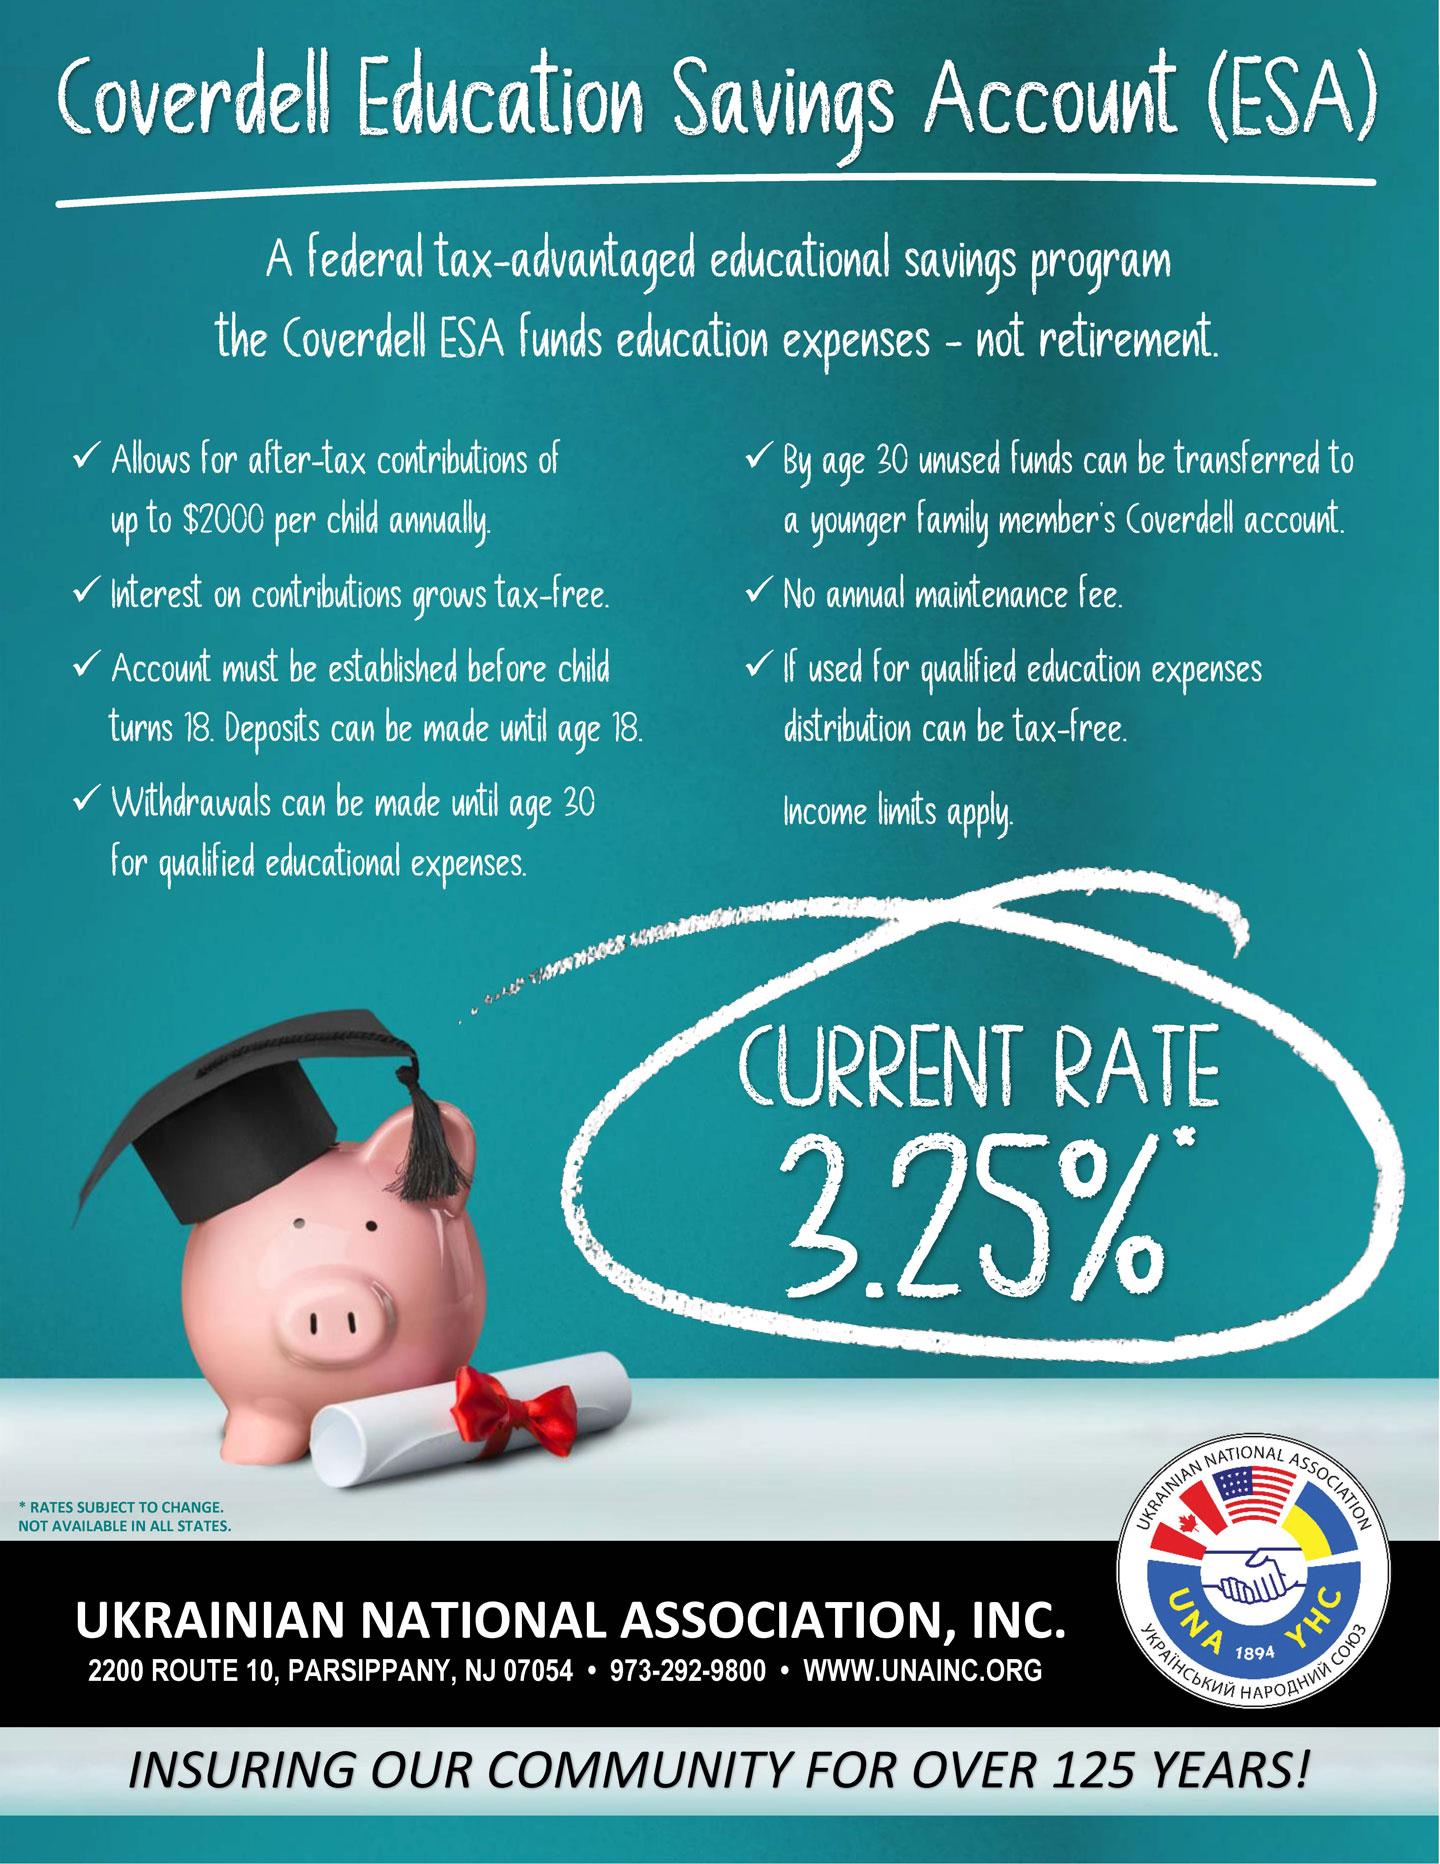 UNA Coverdell Education Savings Account (ESA)